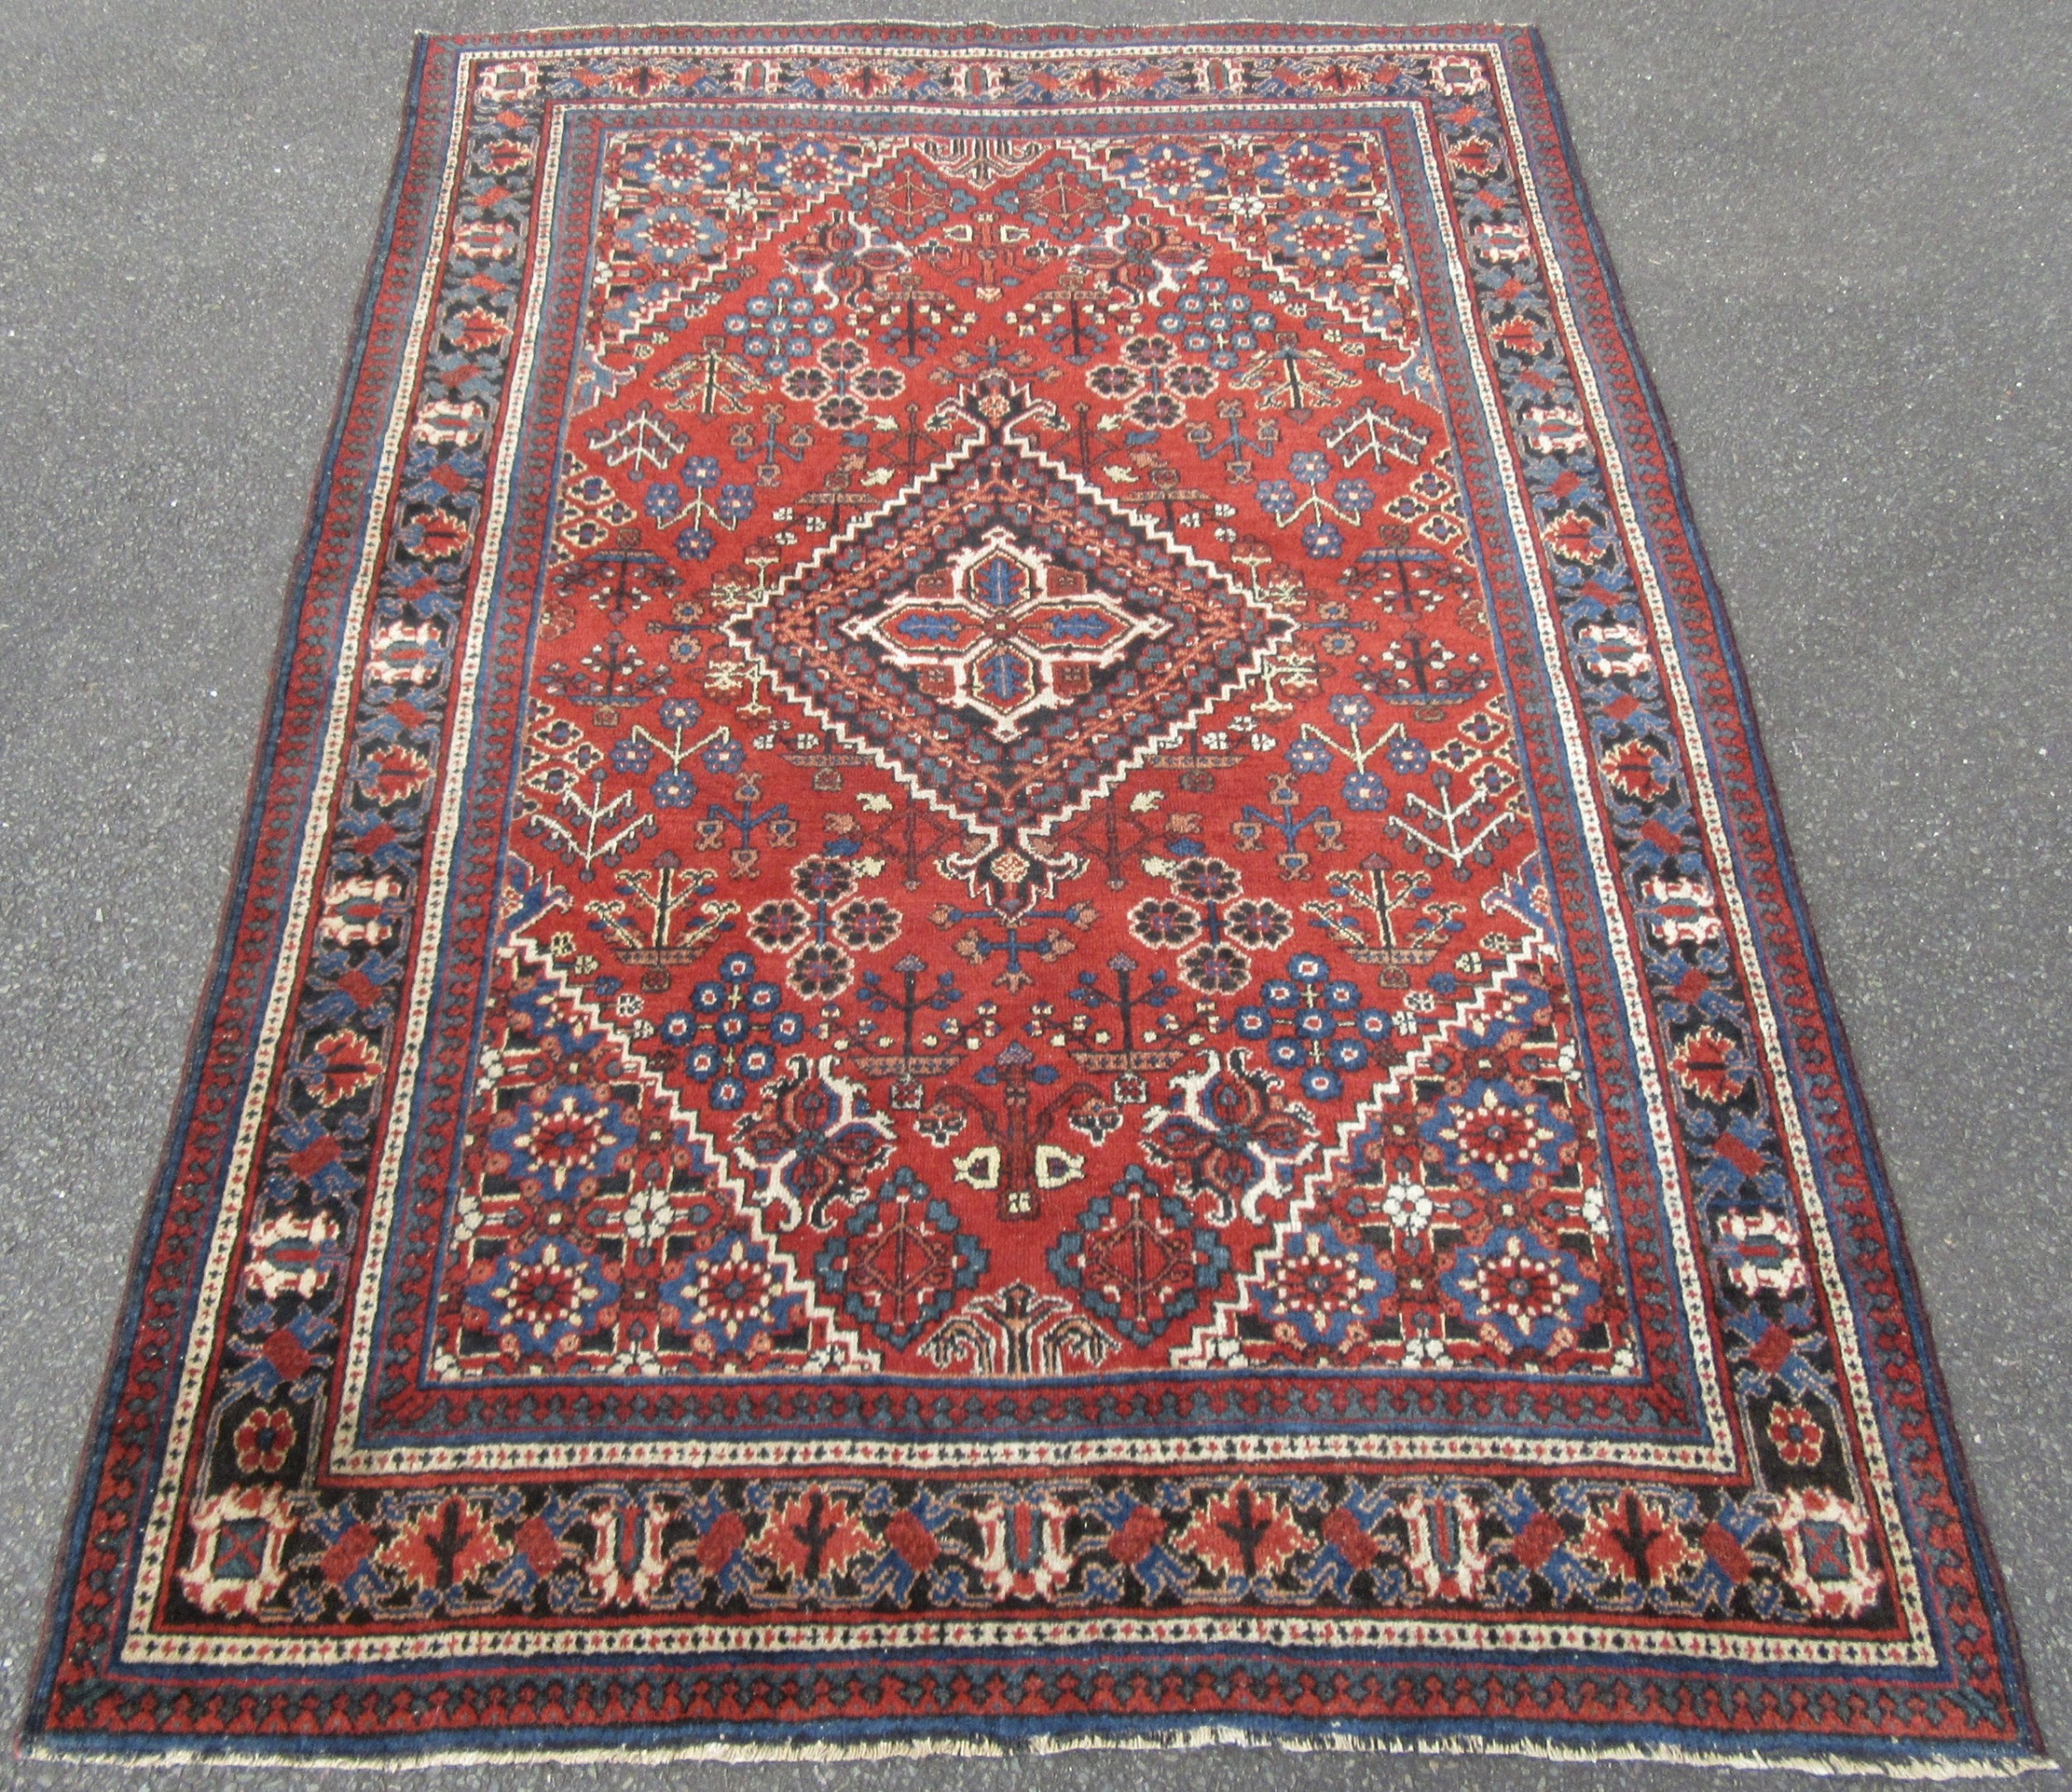 antique country house persian joshegan kashan rug velvety wool pile